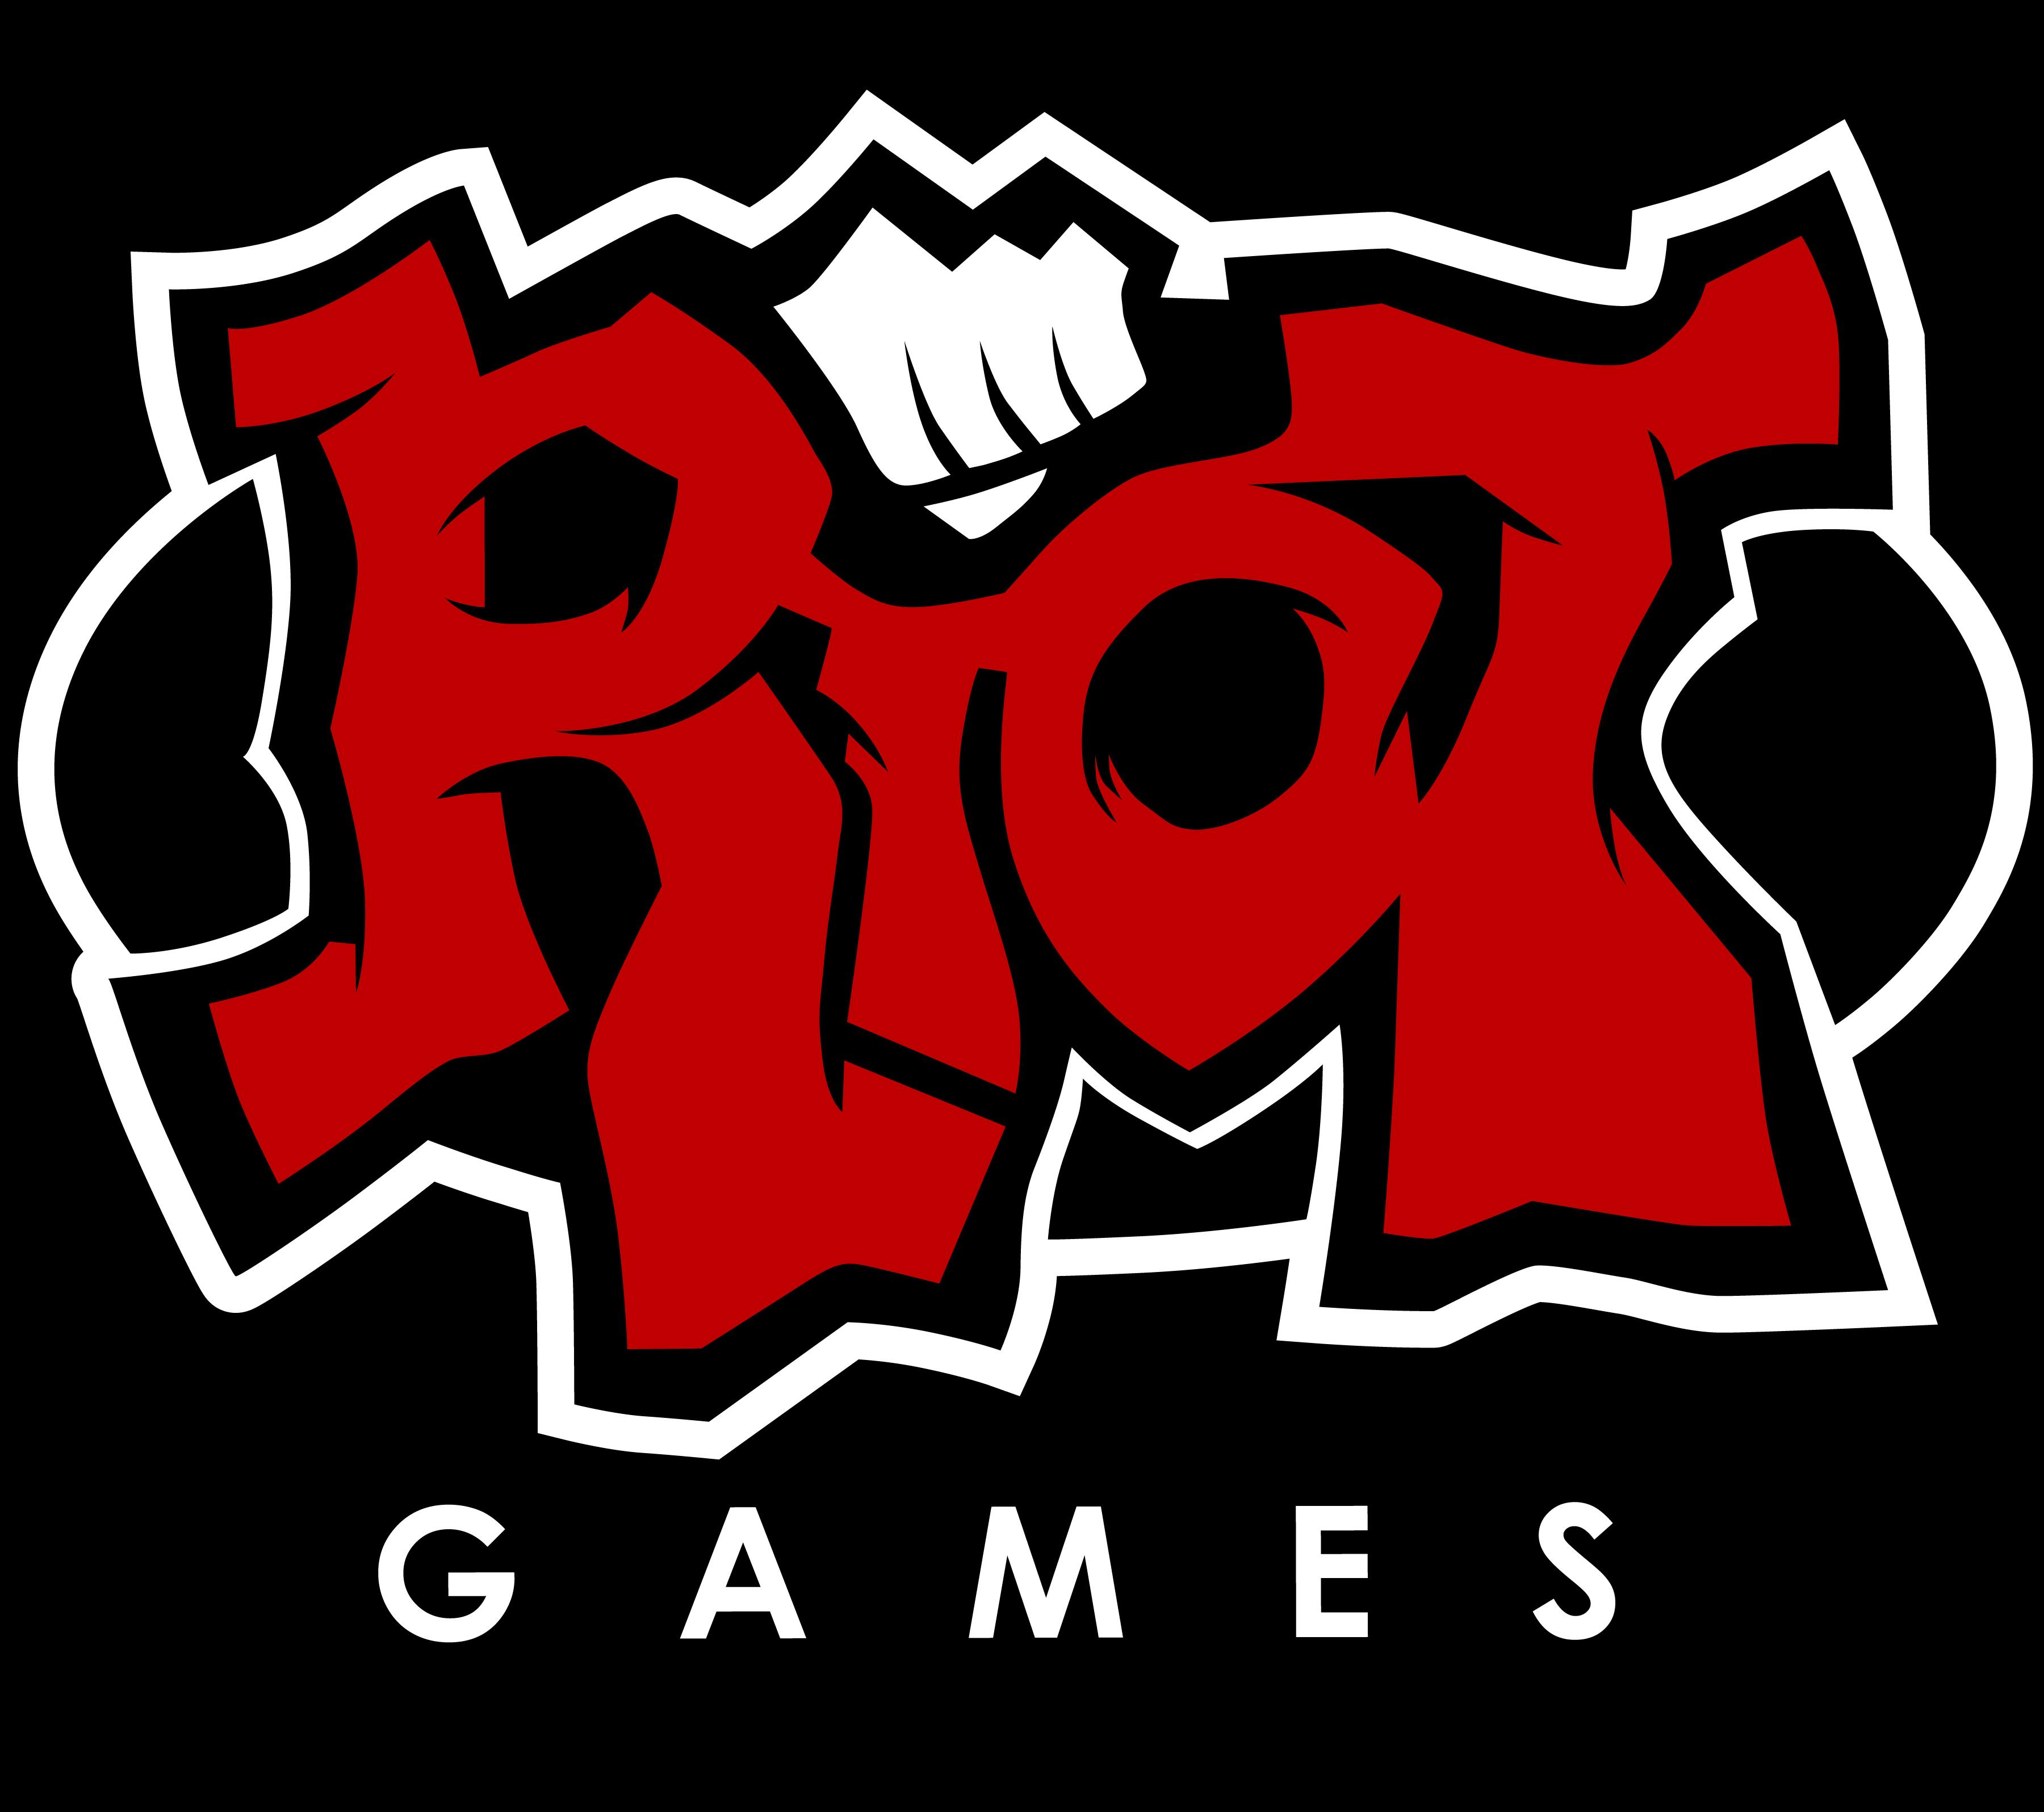 Riot_logo_black_background11